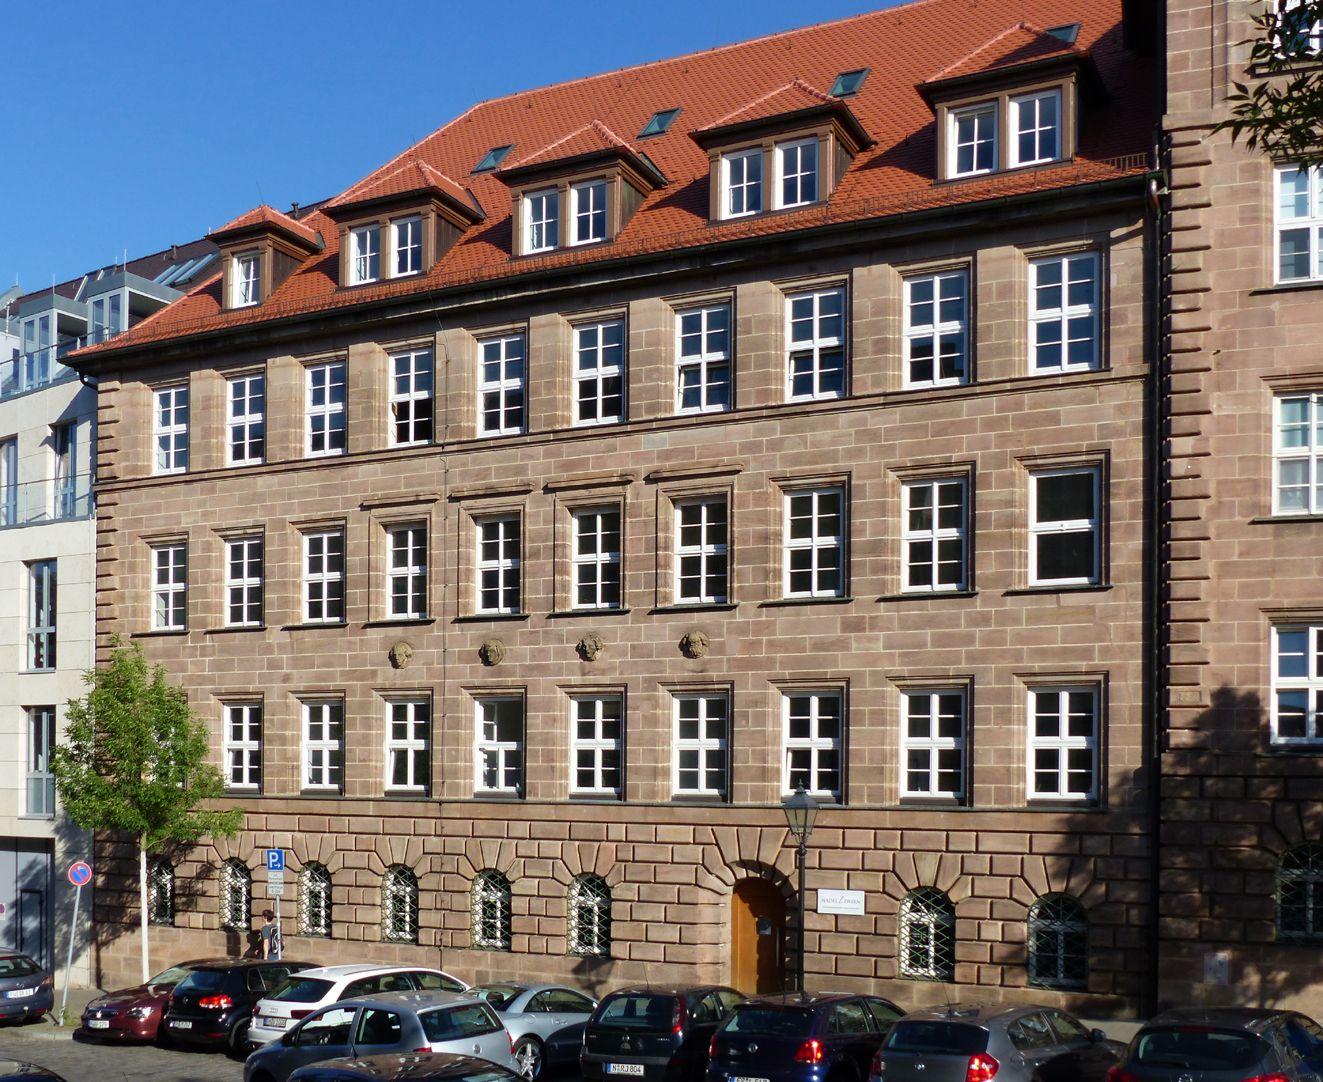 ehemalige Allgemeine Ortskrankenkasse linker Gebäudeflügel